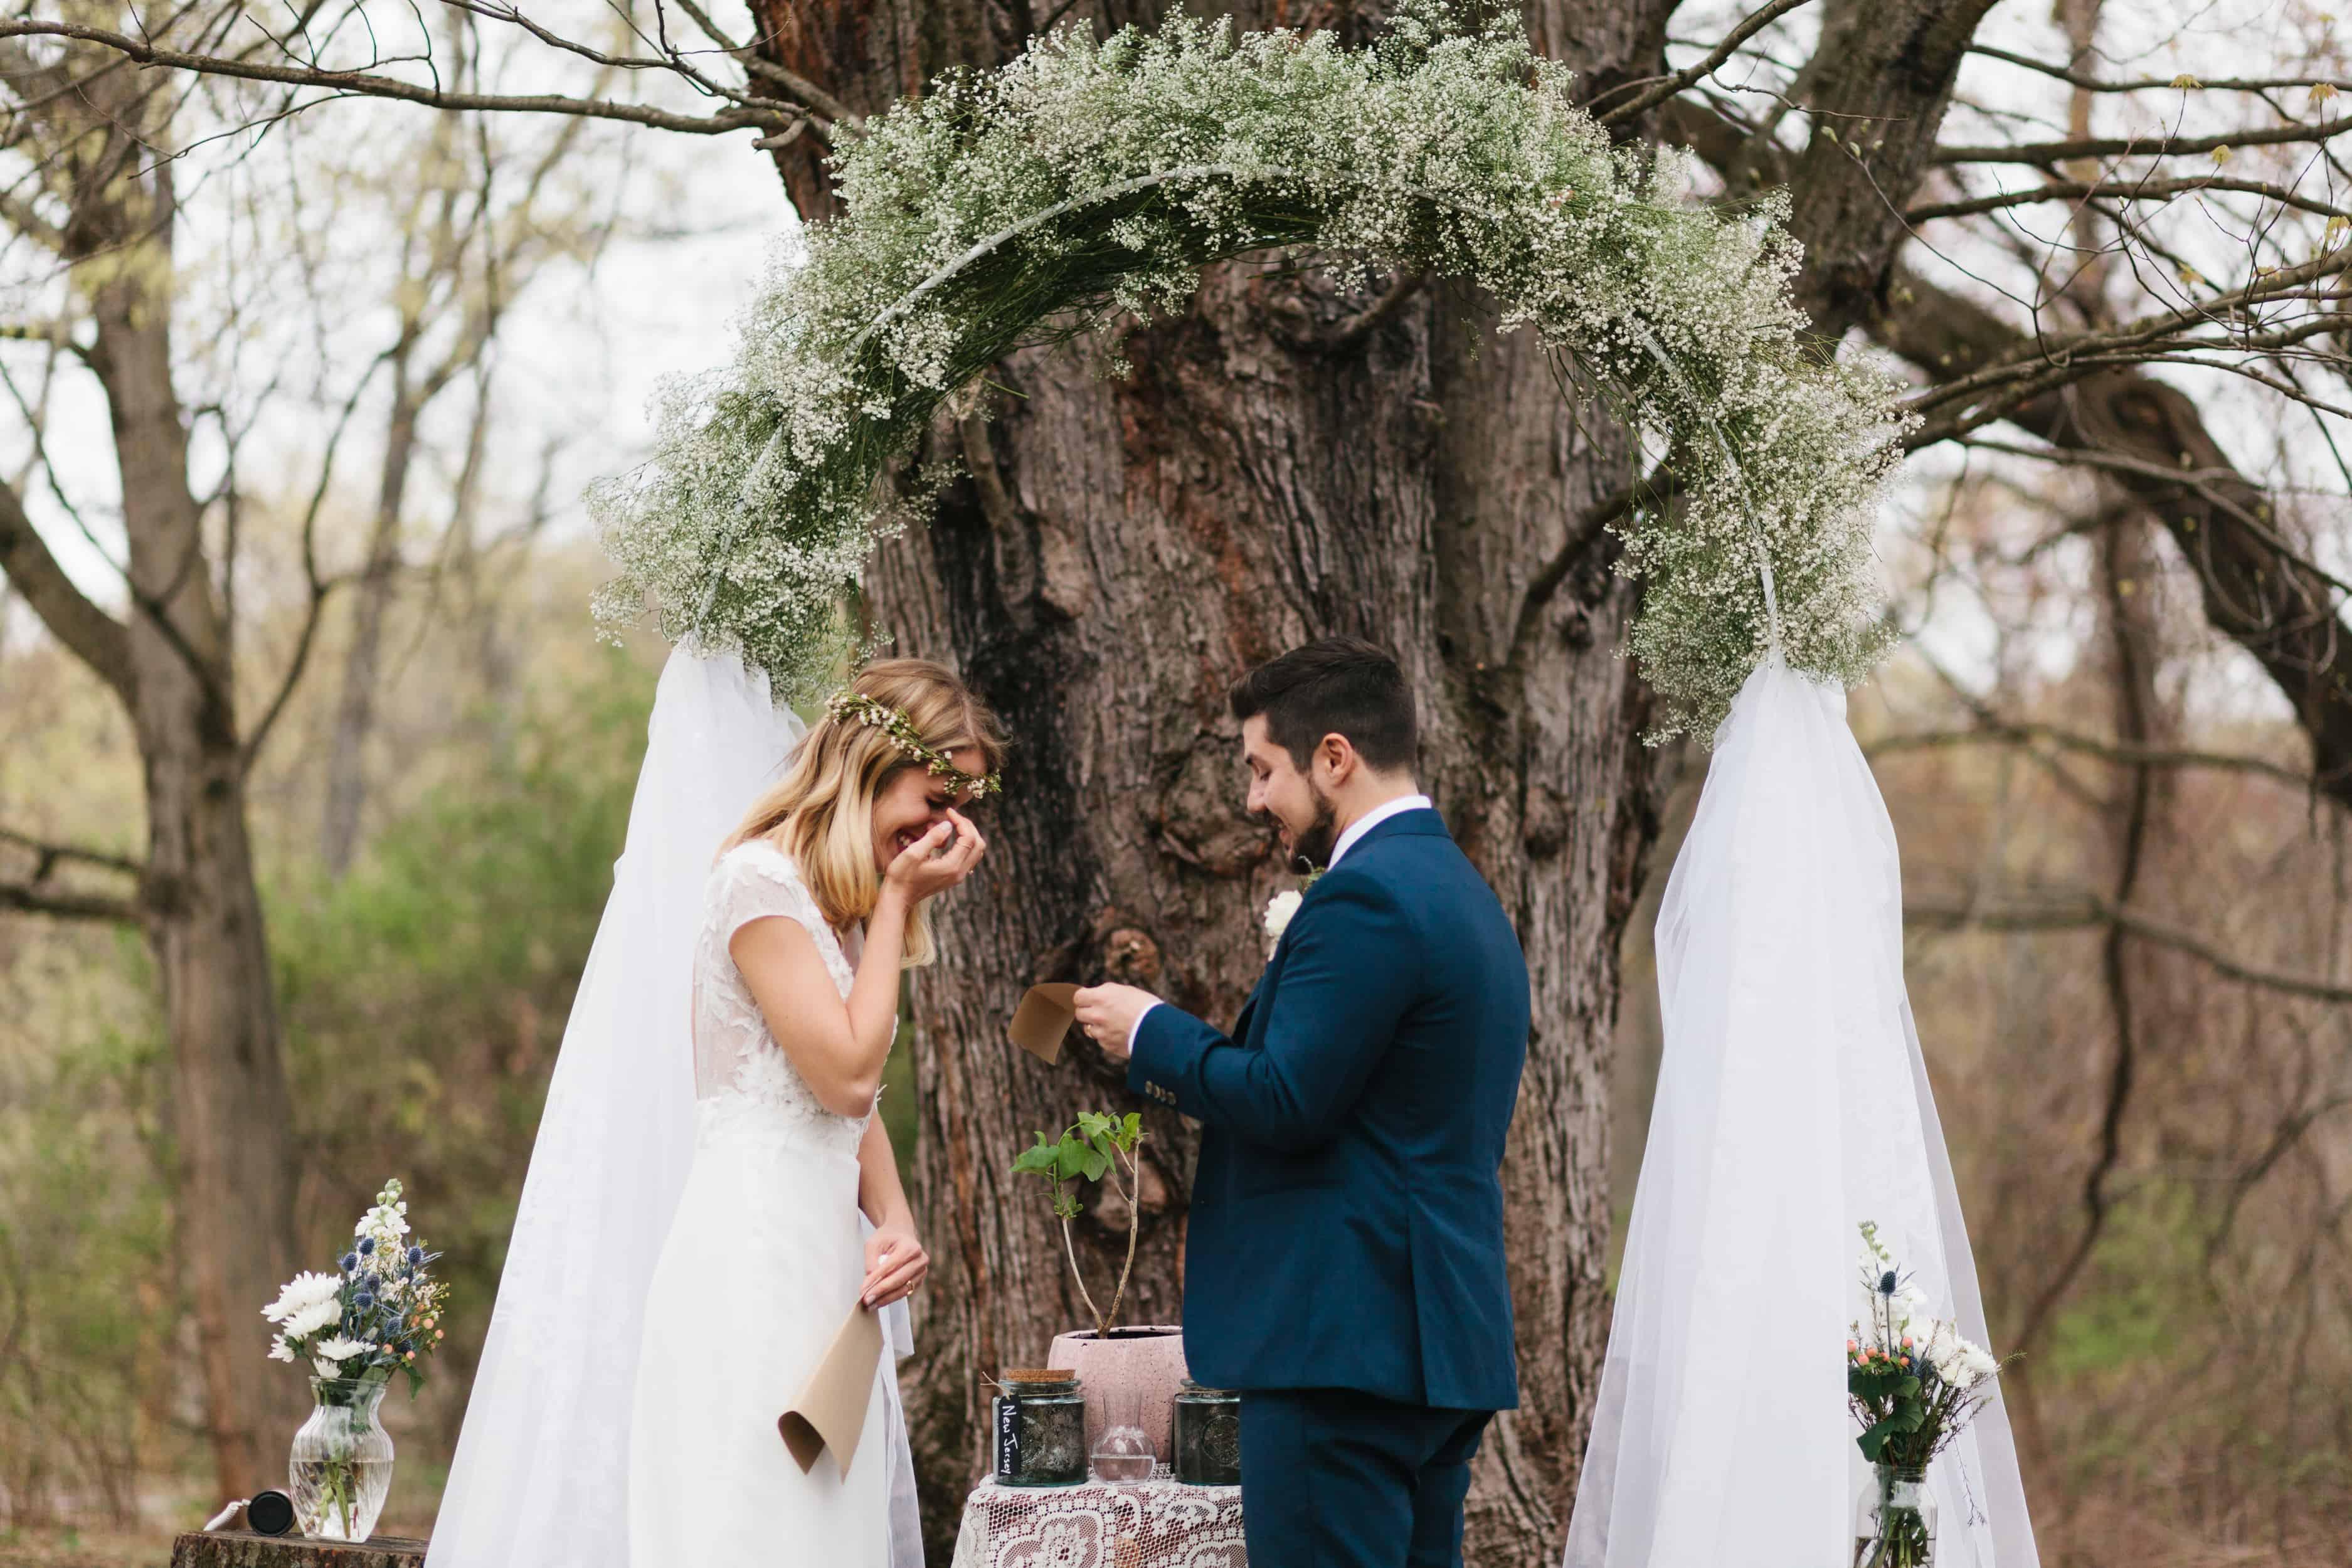 polish american wedding ceremony